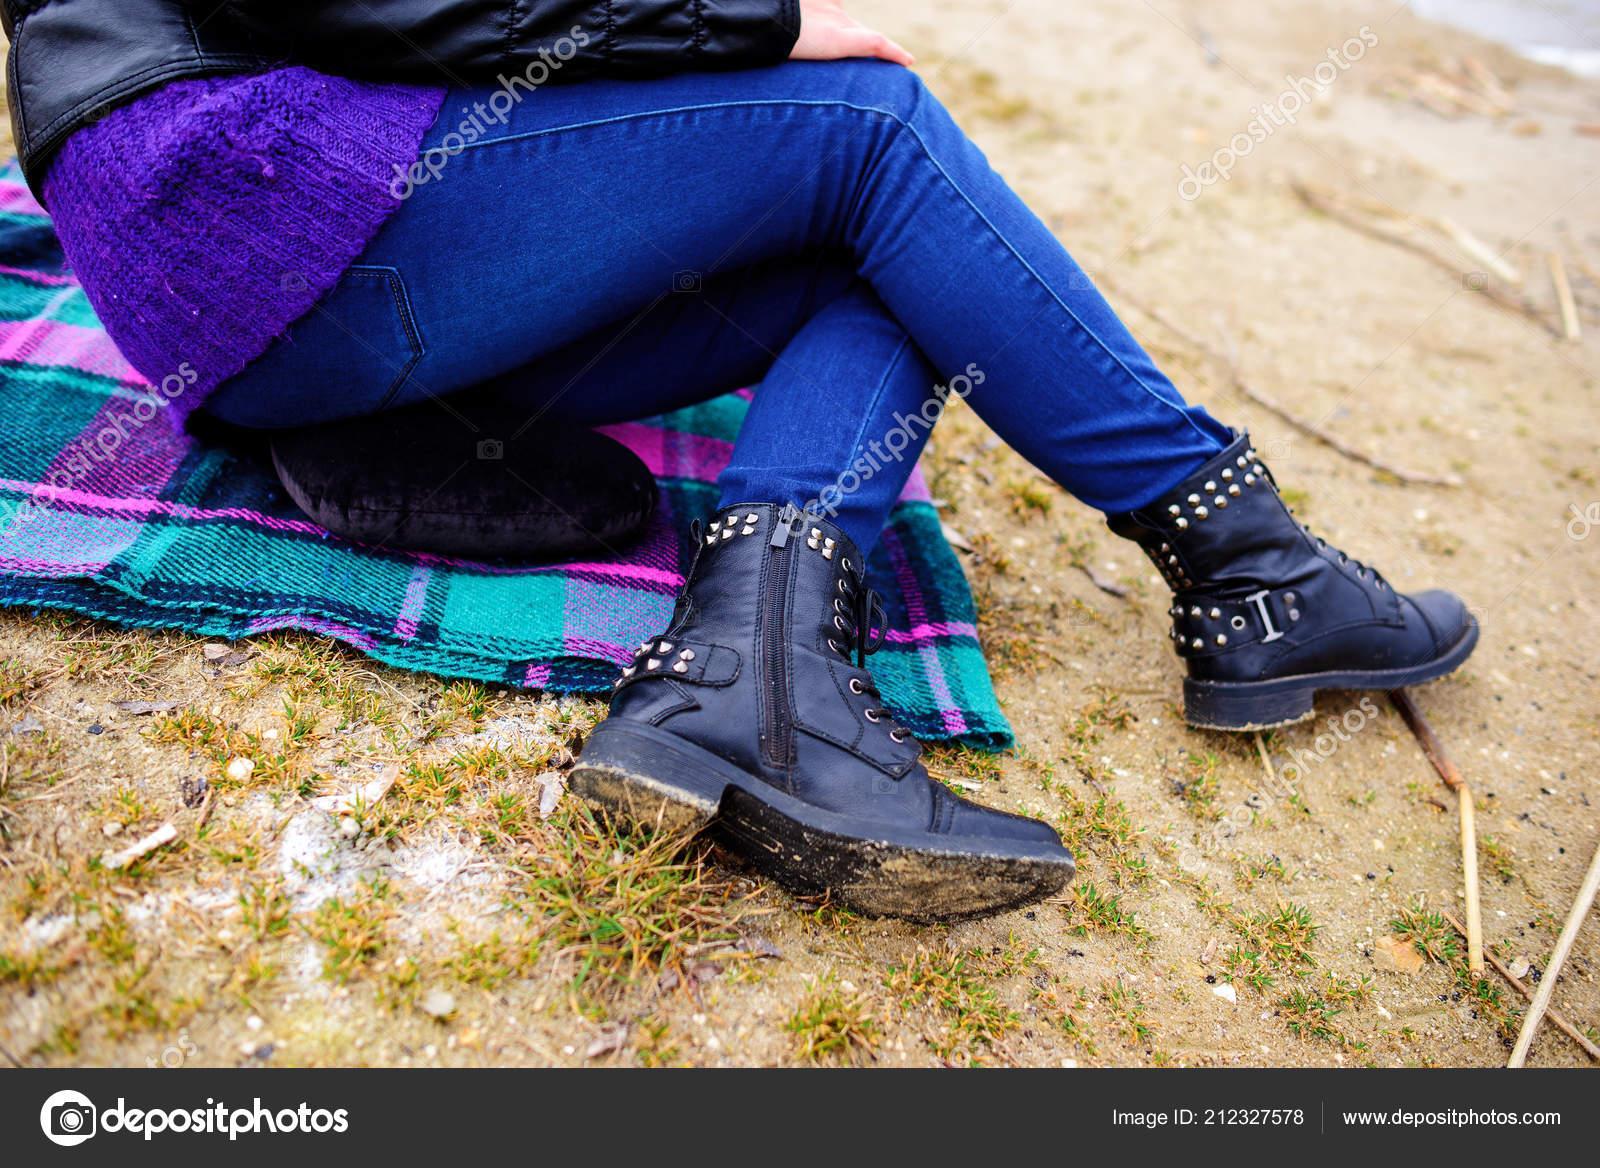 Azules Pantalones Pies Mujeres Invierno Vaqueros Botas Negro Las x6S8IqSw4